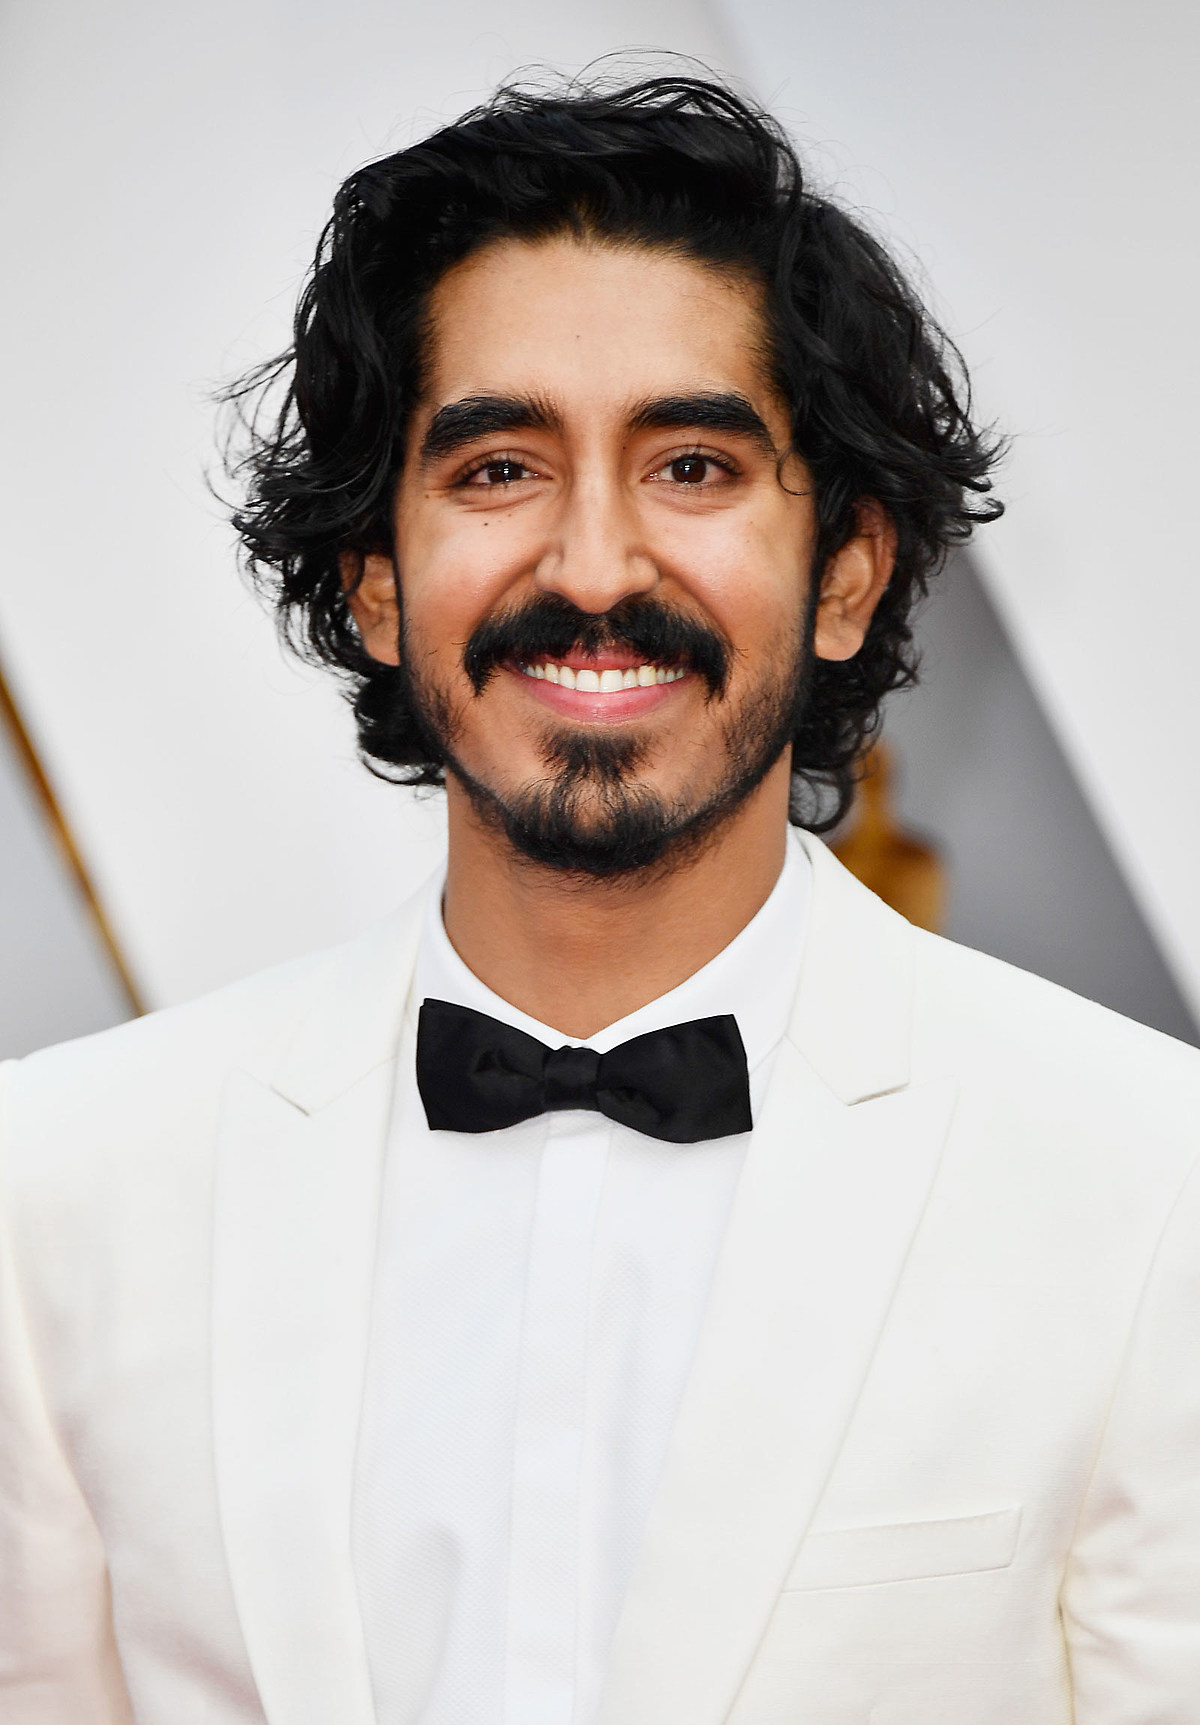 Dev Patel's White Tuxedo Evokes Old Hollywood at 2017 Oscars